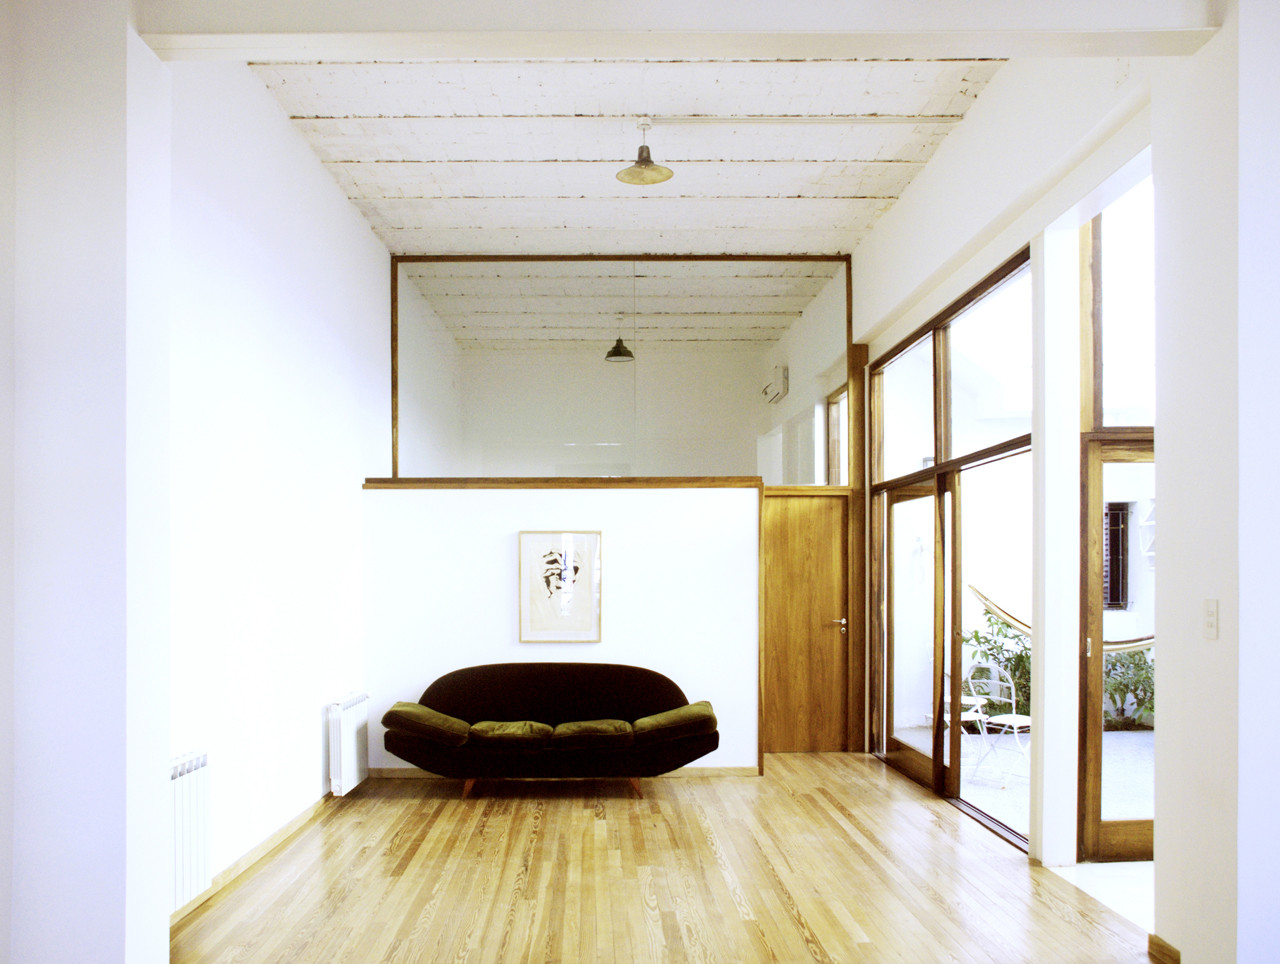 Casa Vlady: House Refurbishment / BVW Arquitectos, © Lula Bauer / BVW Arquitectos